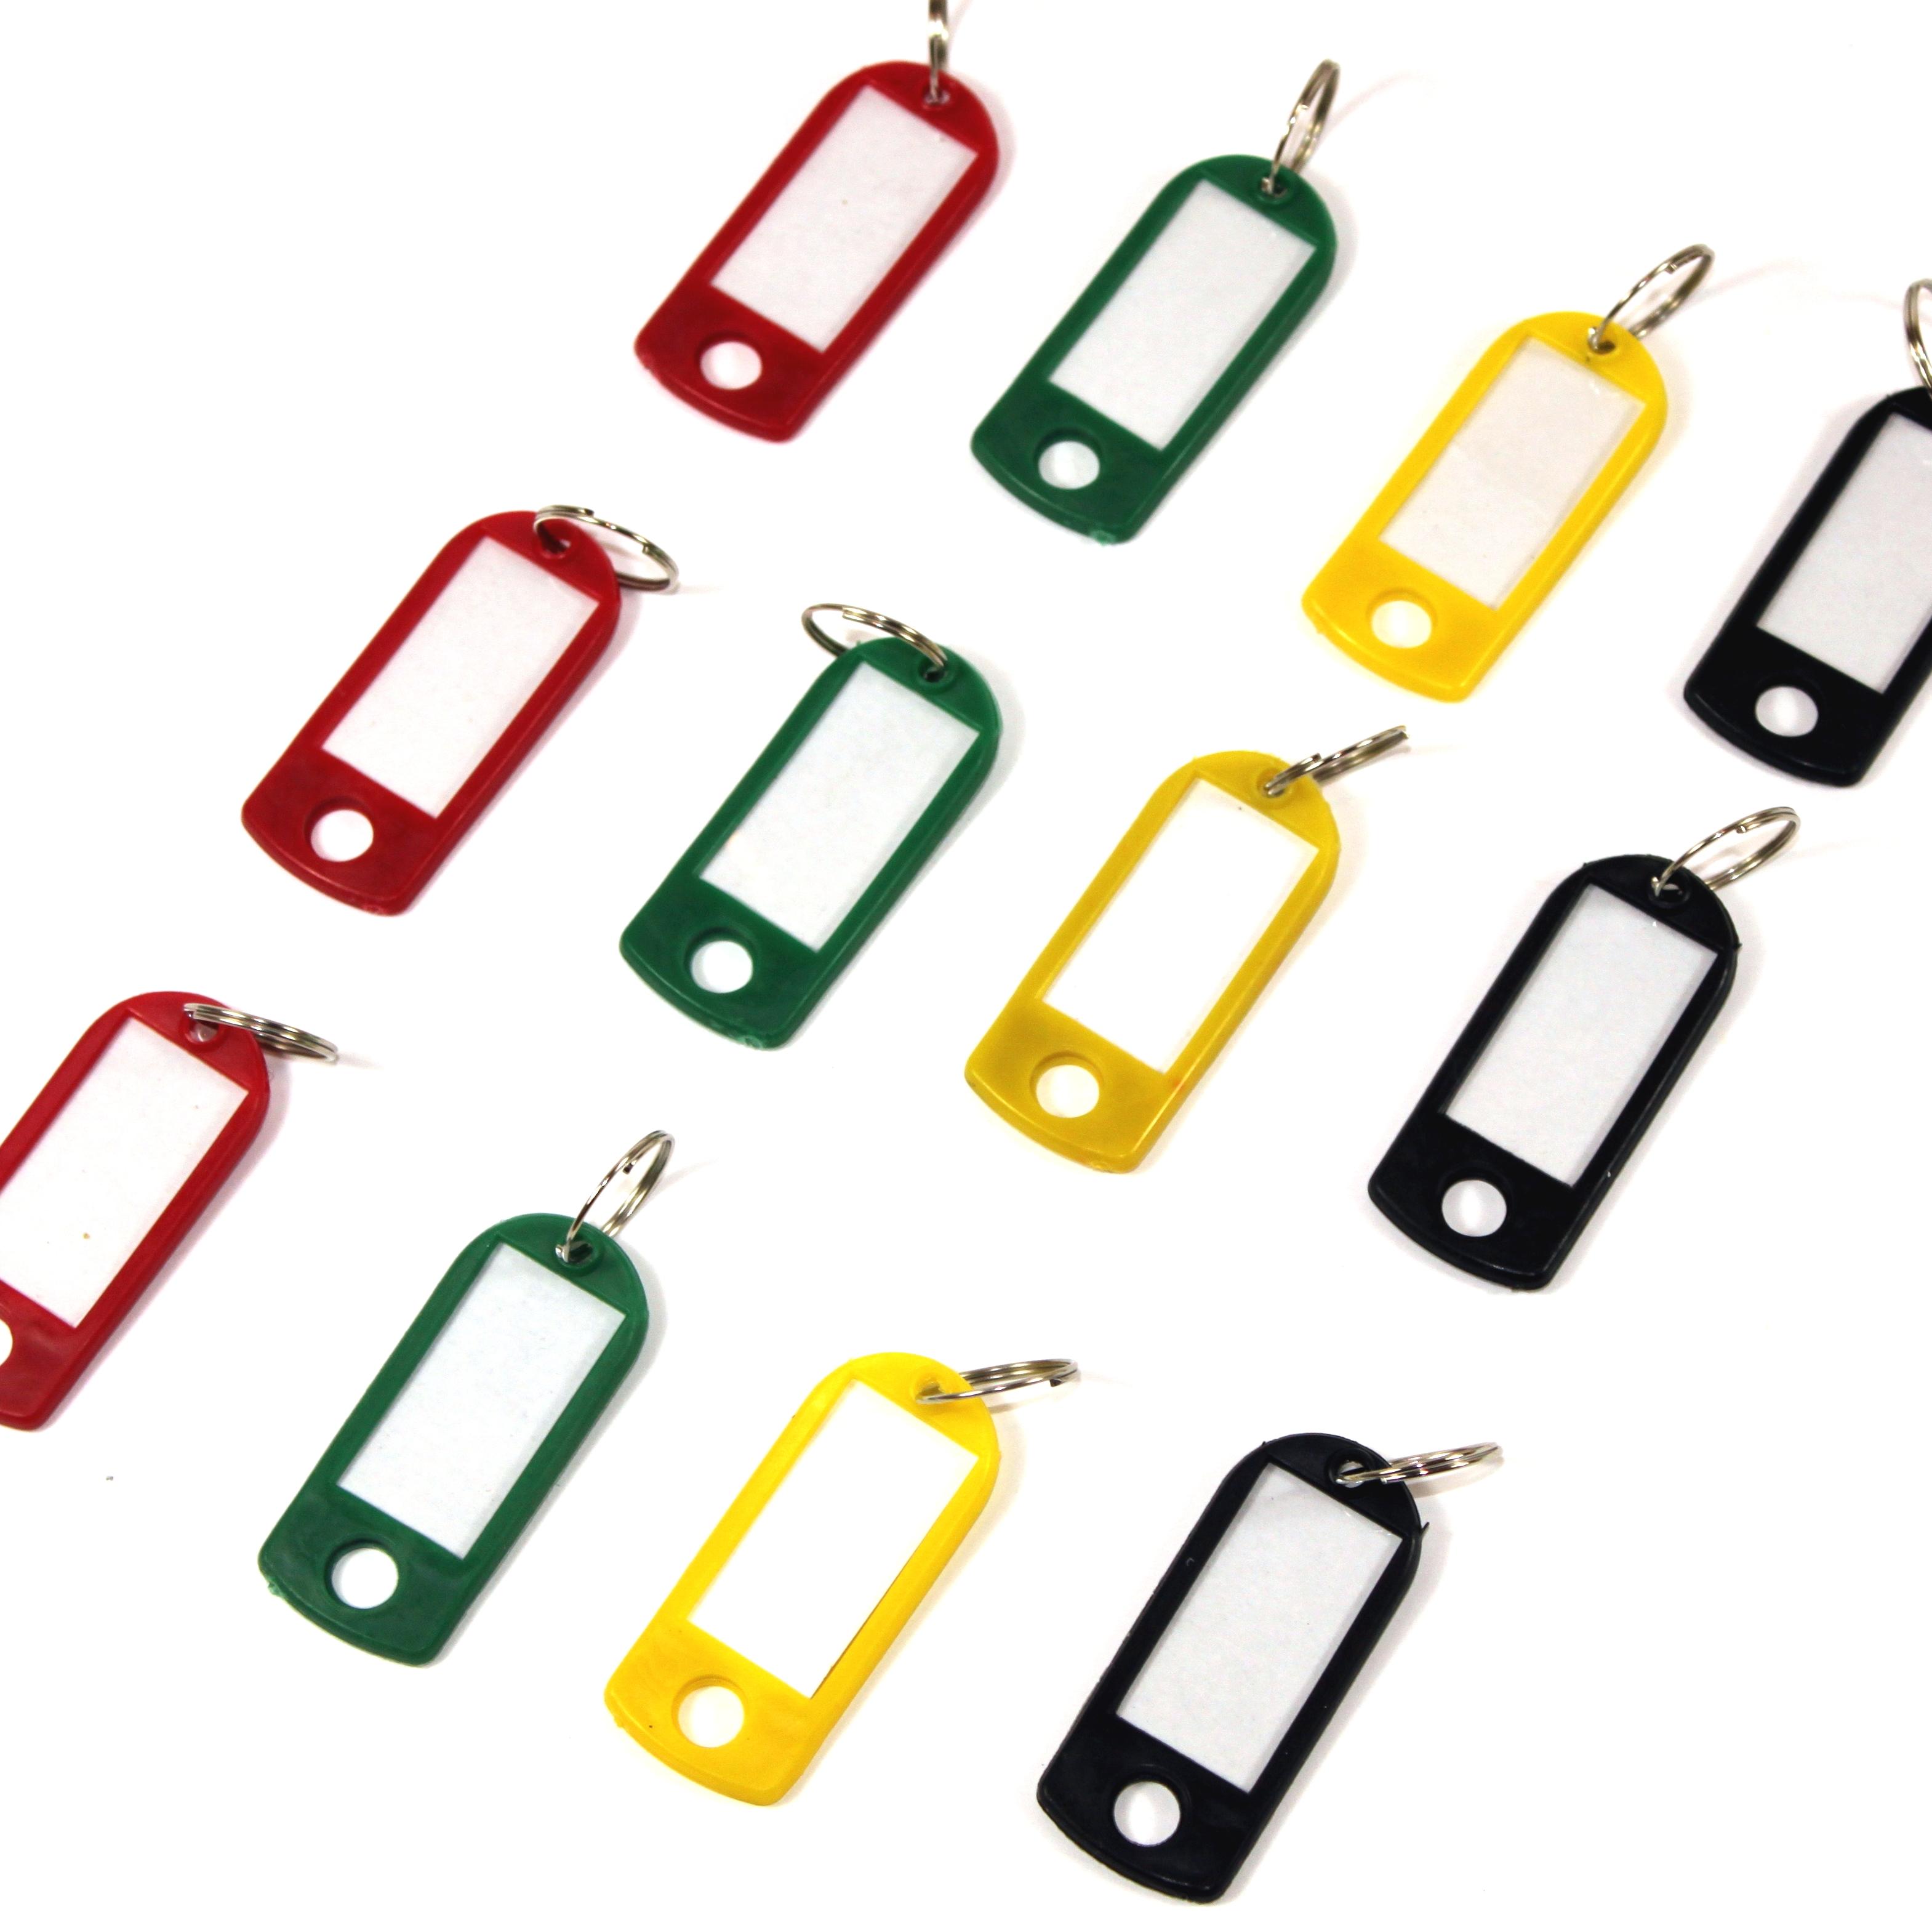 zum-Beschriften Bunt Schlüsselschilder Schlüsselanhänger